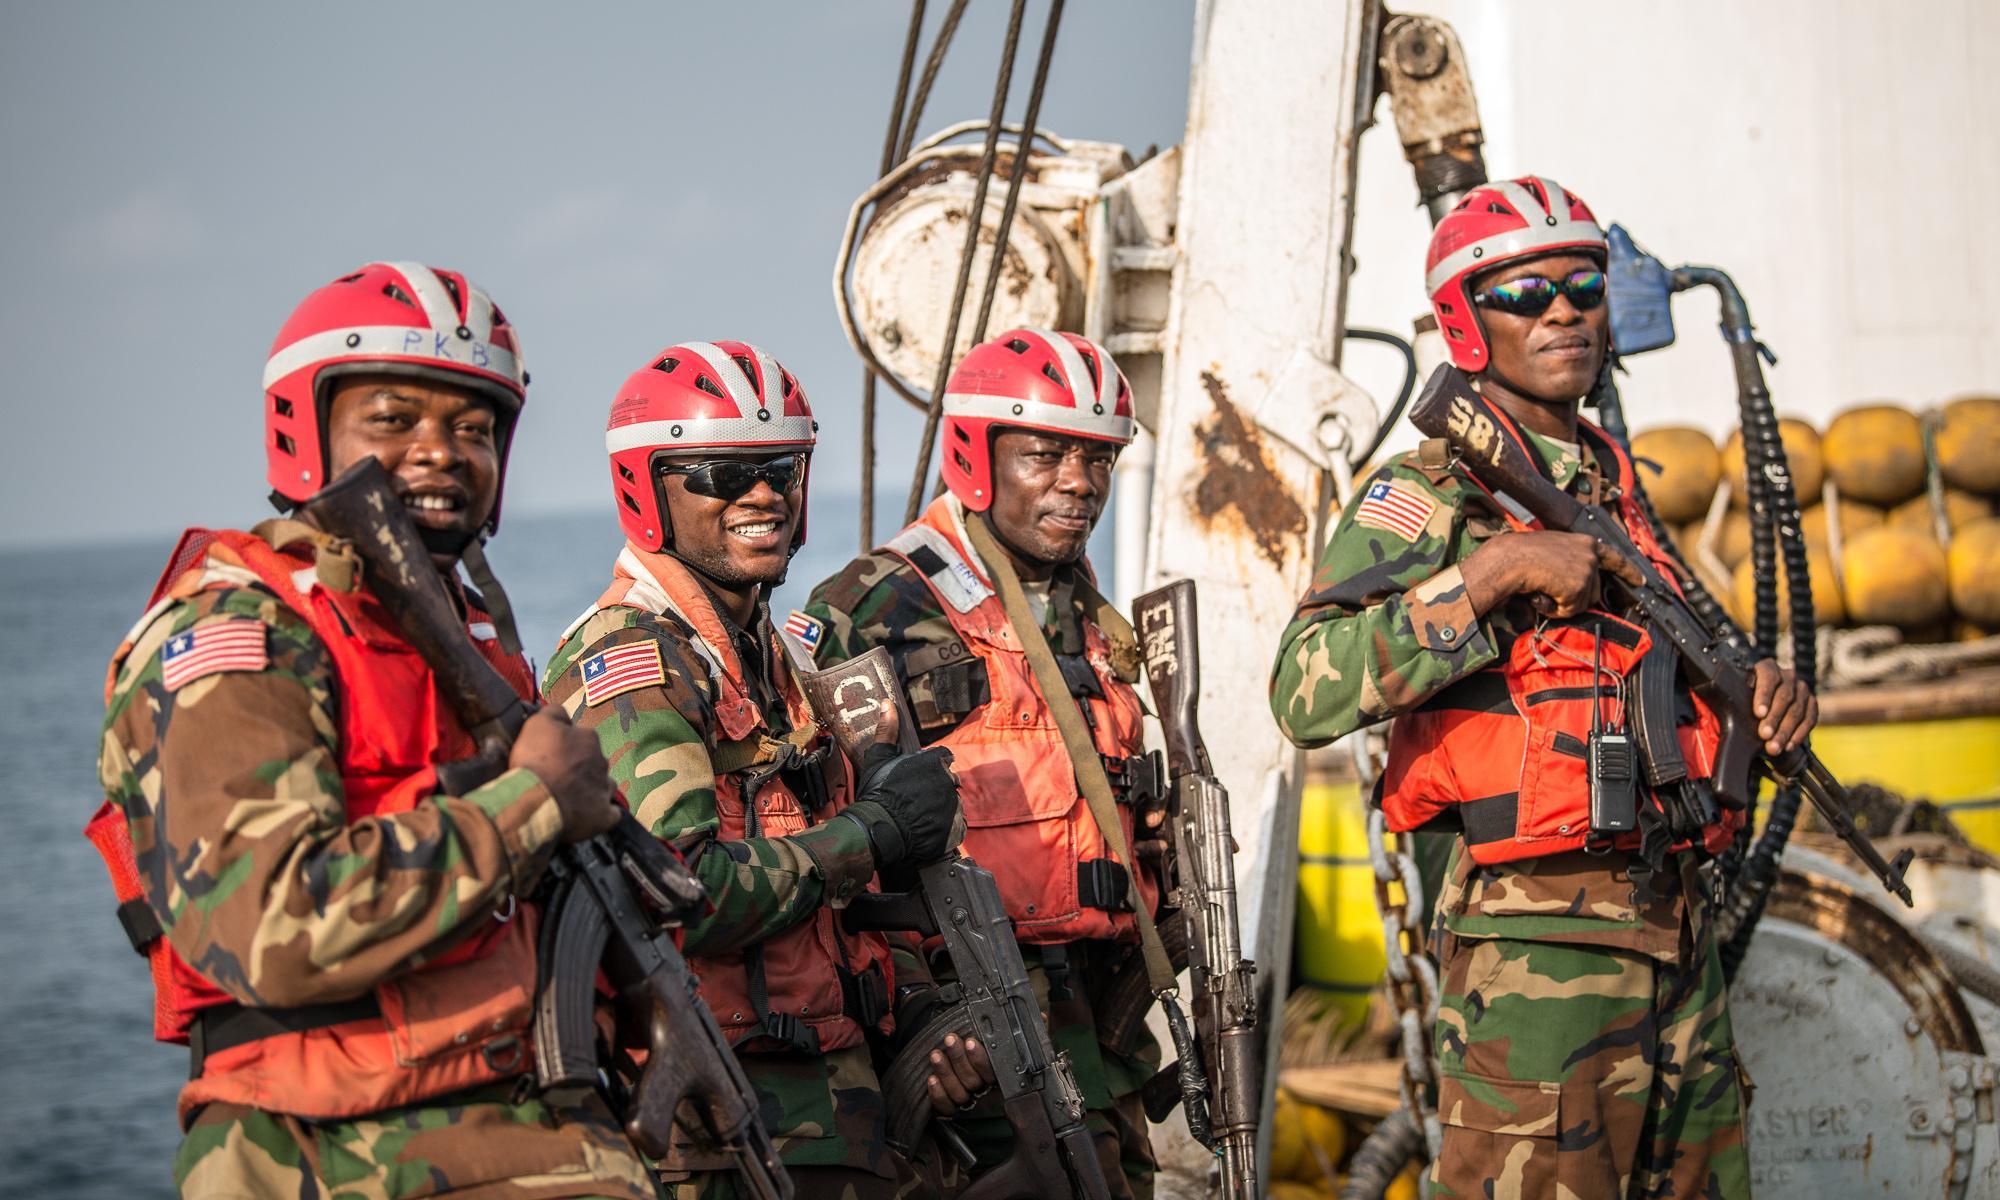 Liberia's eco-vigilantes score arresting success in struggle to end illegal fishing